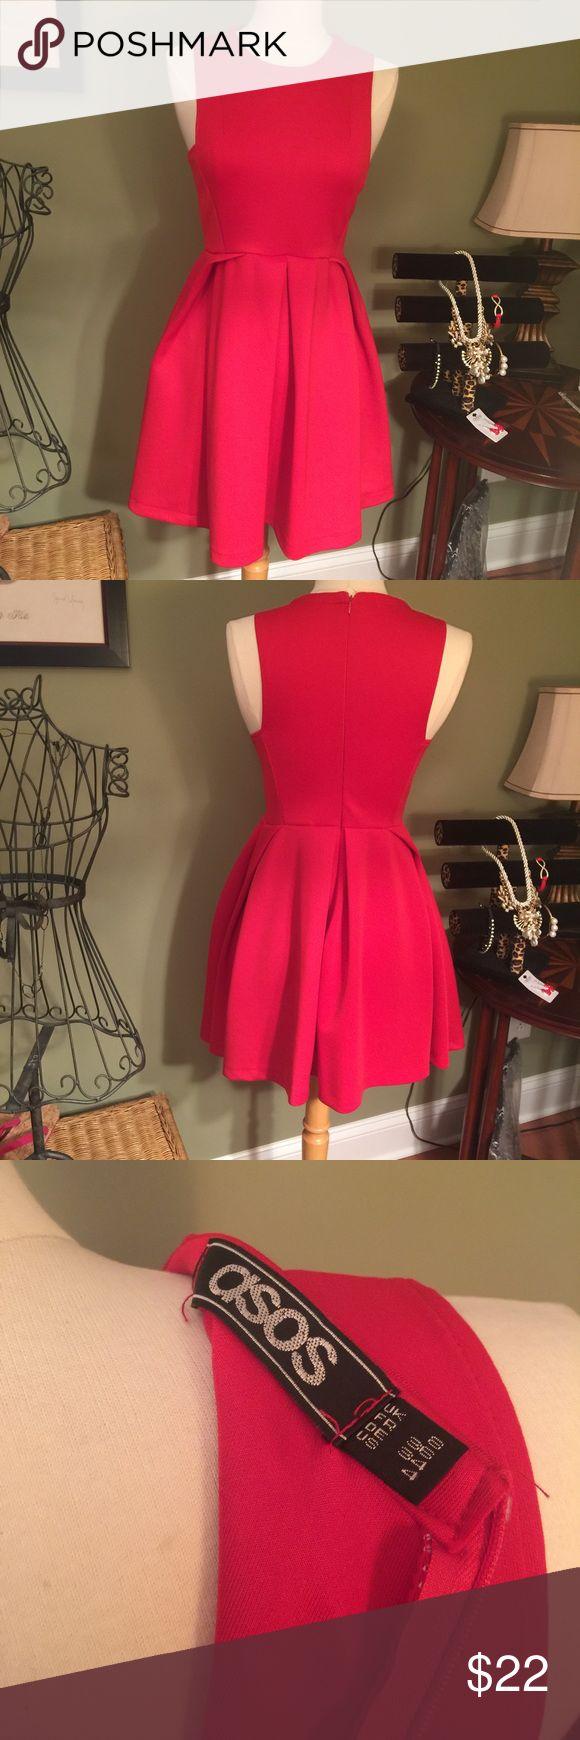 Fabulous New Red Dress Size 4 💃💃 So beautiful NEW Asos red dress.  Size 4. ASOS Dresses Midi